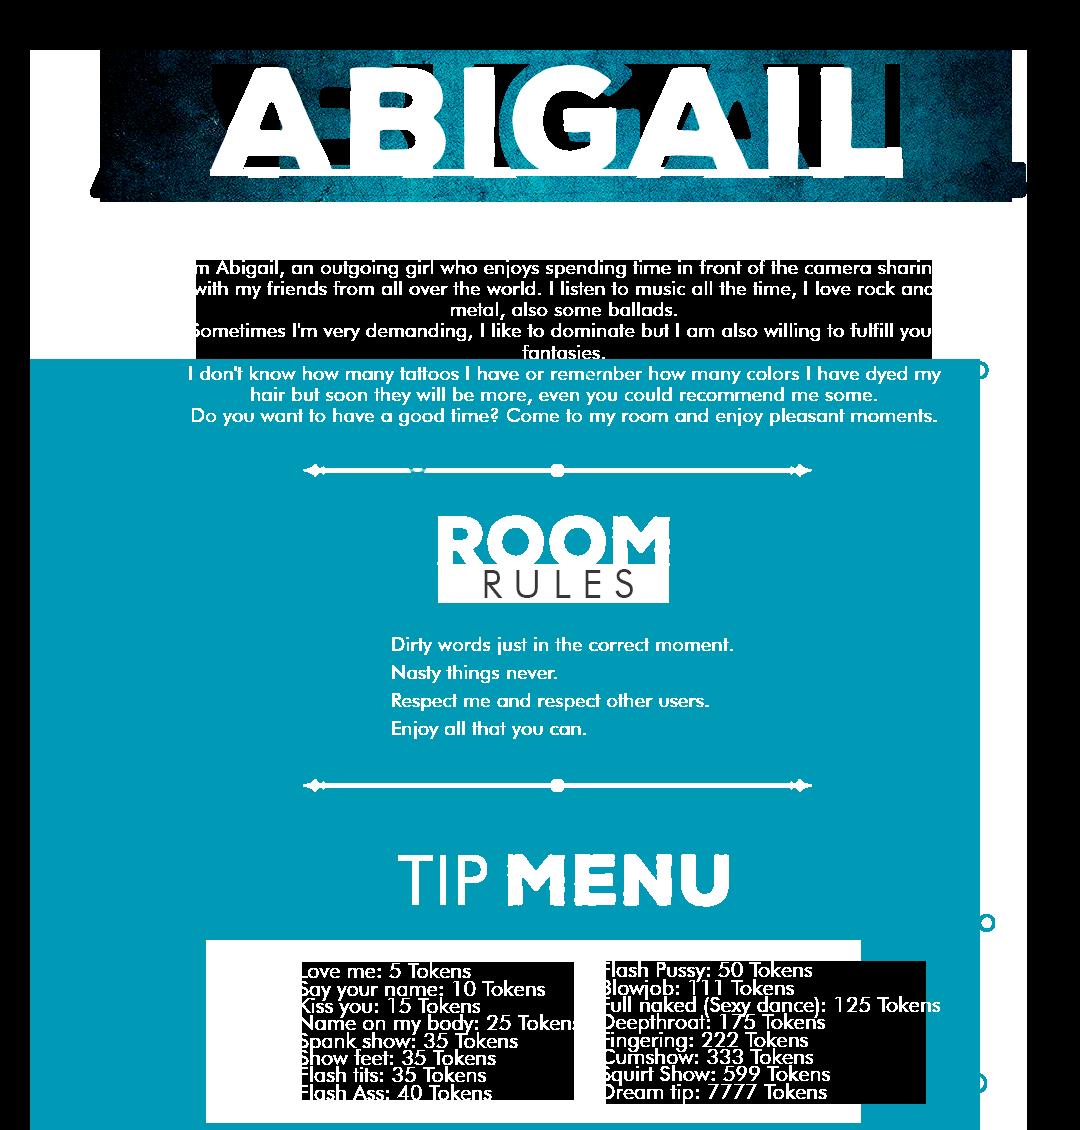 Abbigail1 profile custom pic 1